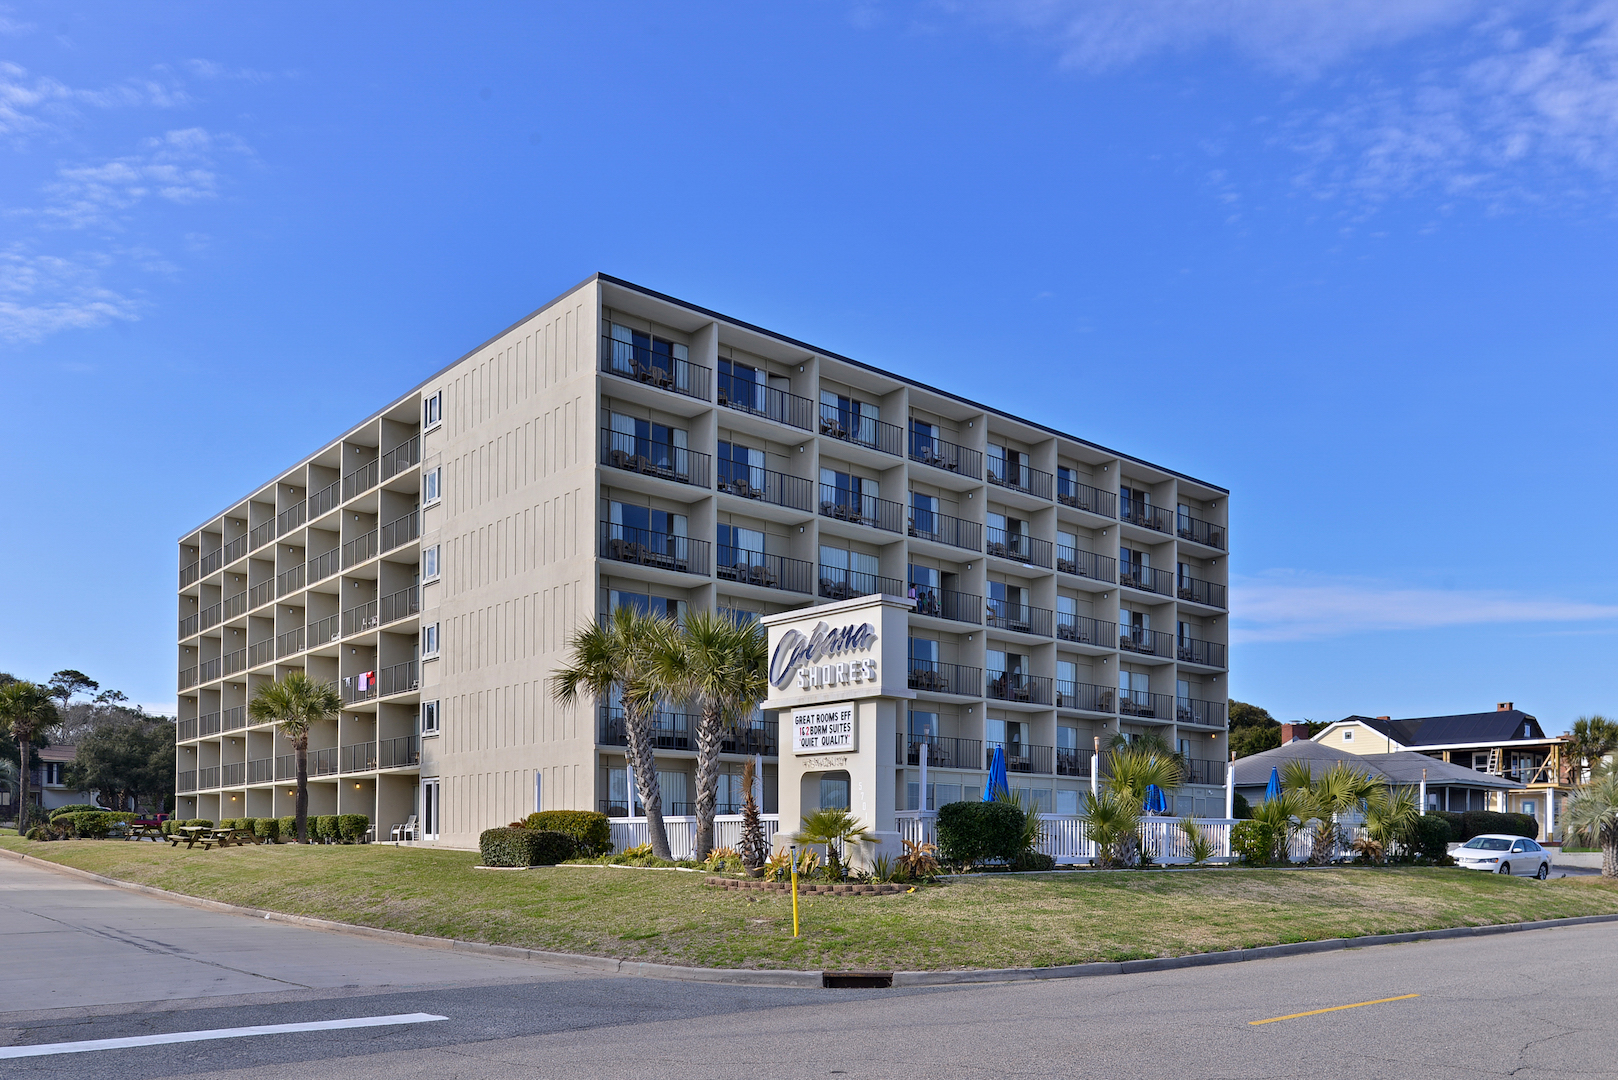 Cabana Shores Inn Myrtle Beach Sc Reviews